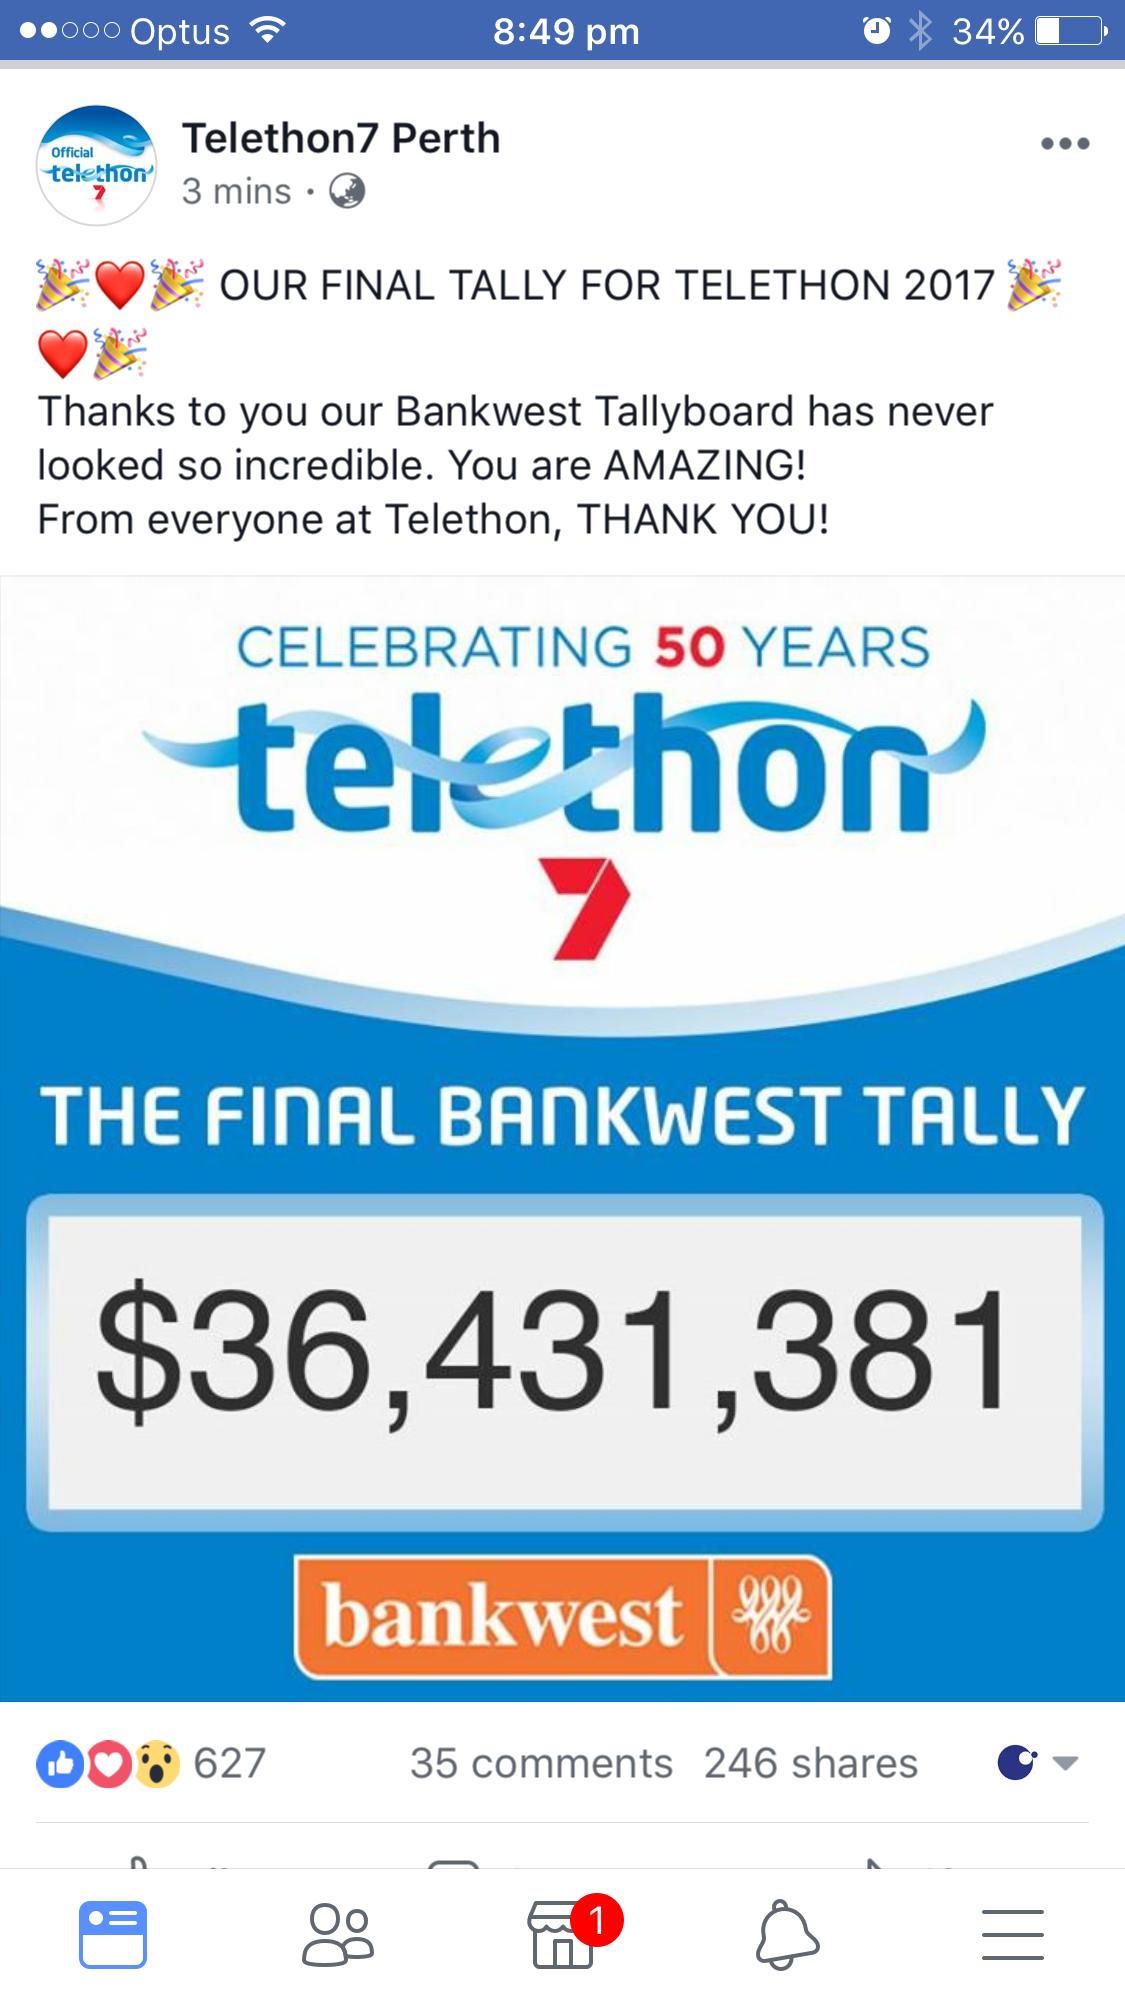 WA you are amazing, smashing last years tally!